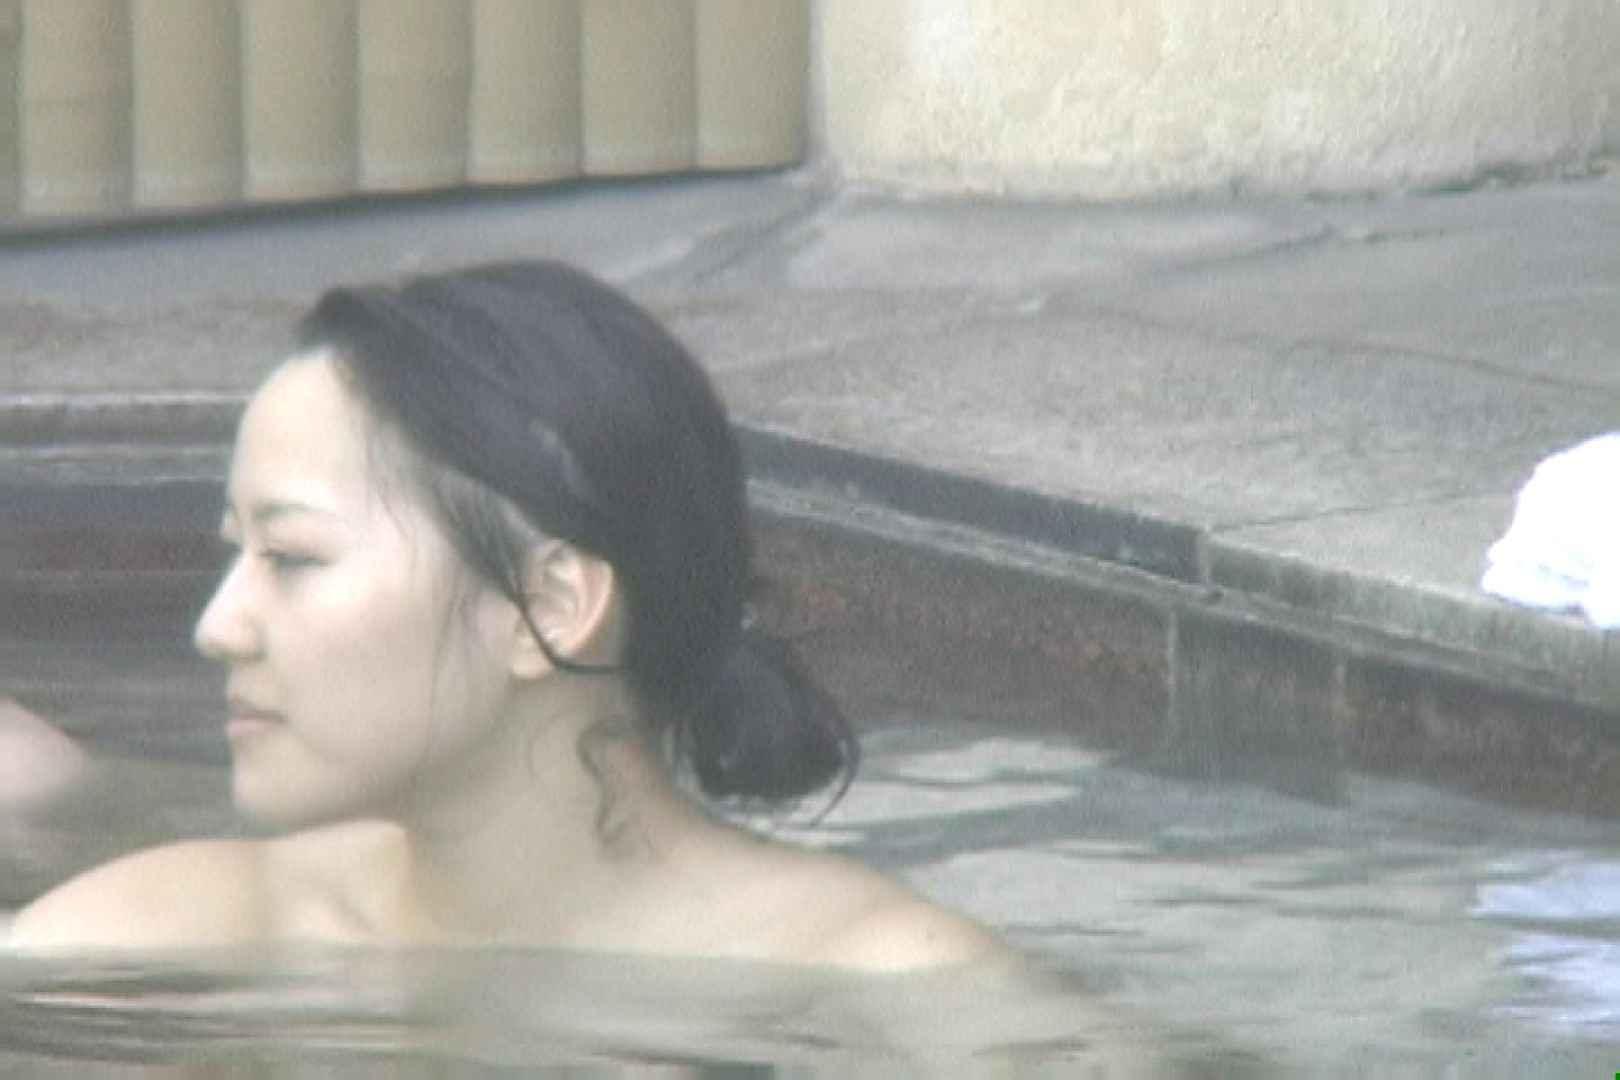 Aquaな露天風呂Vol.689 盗撮  50連発 24